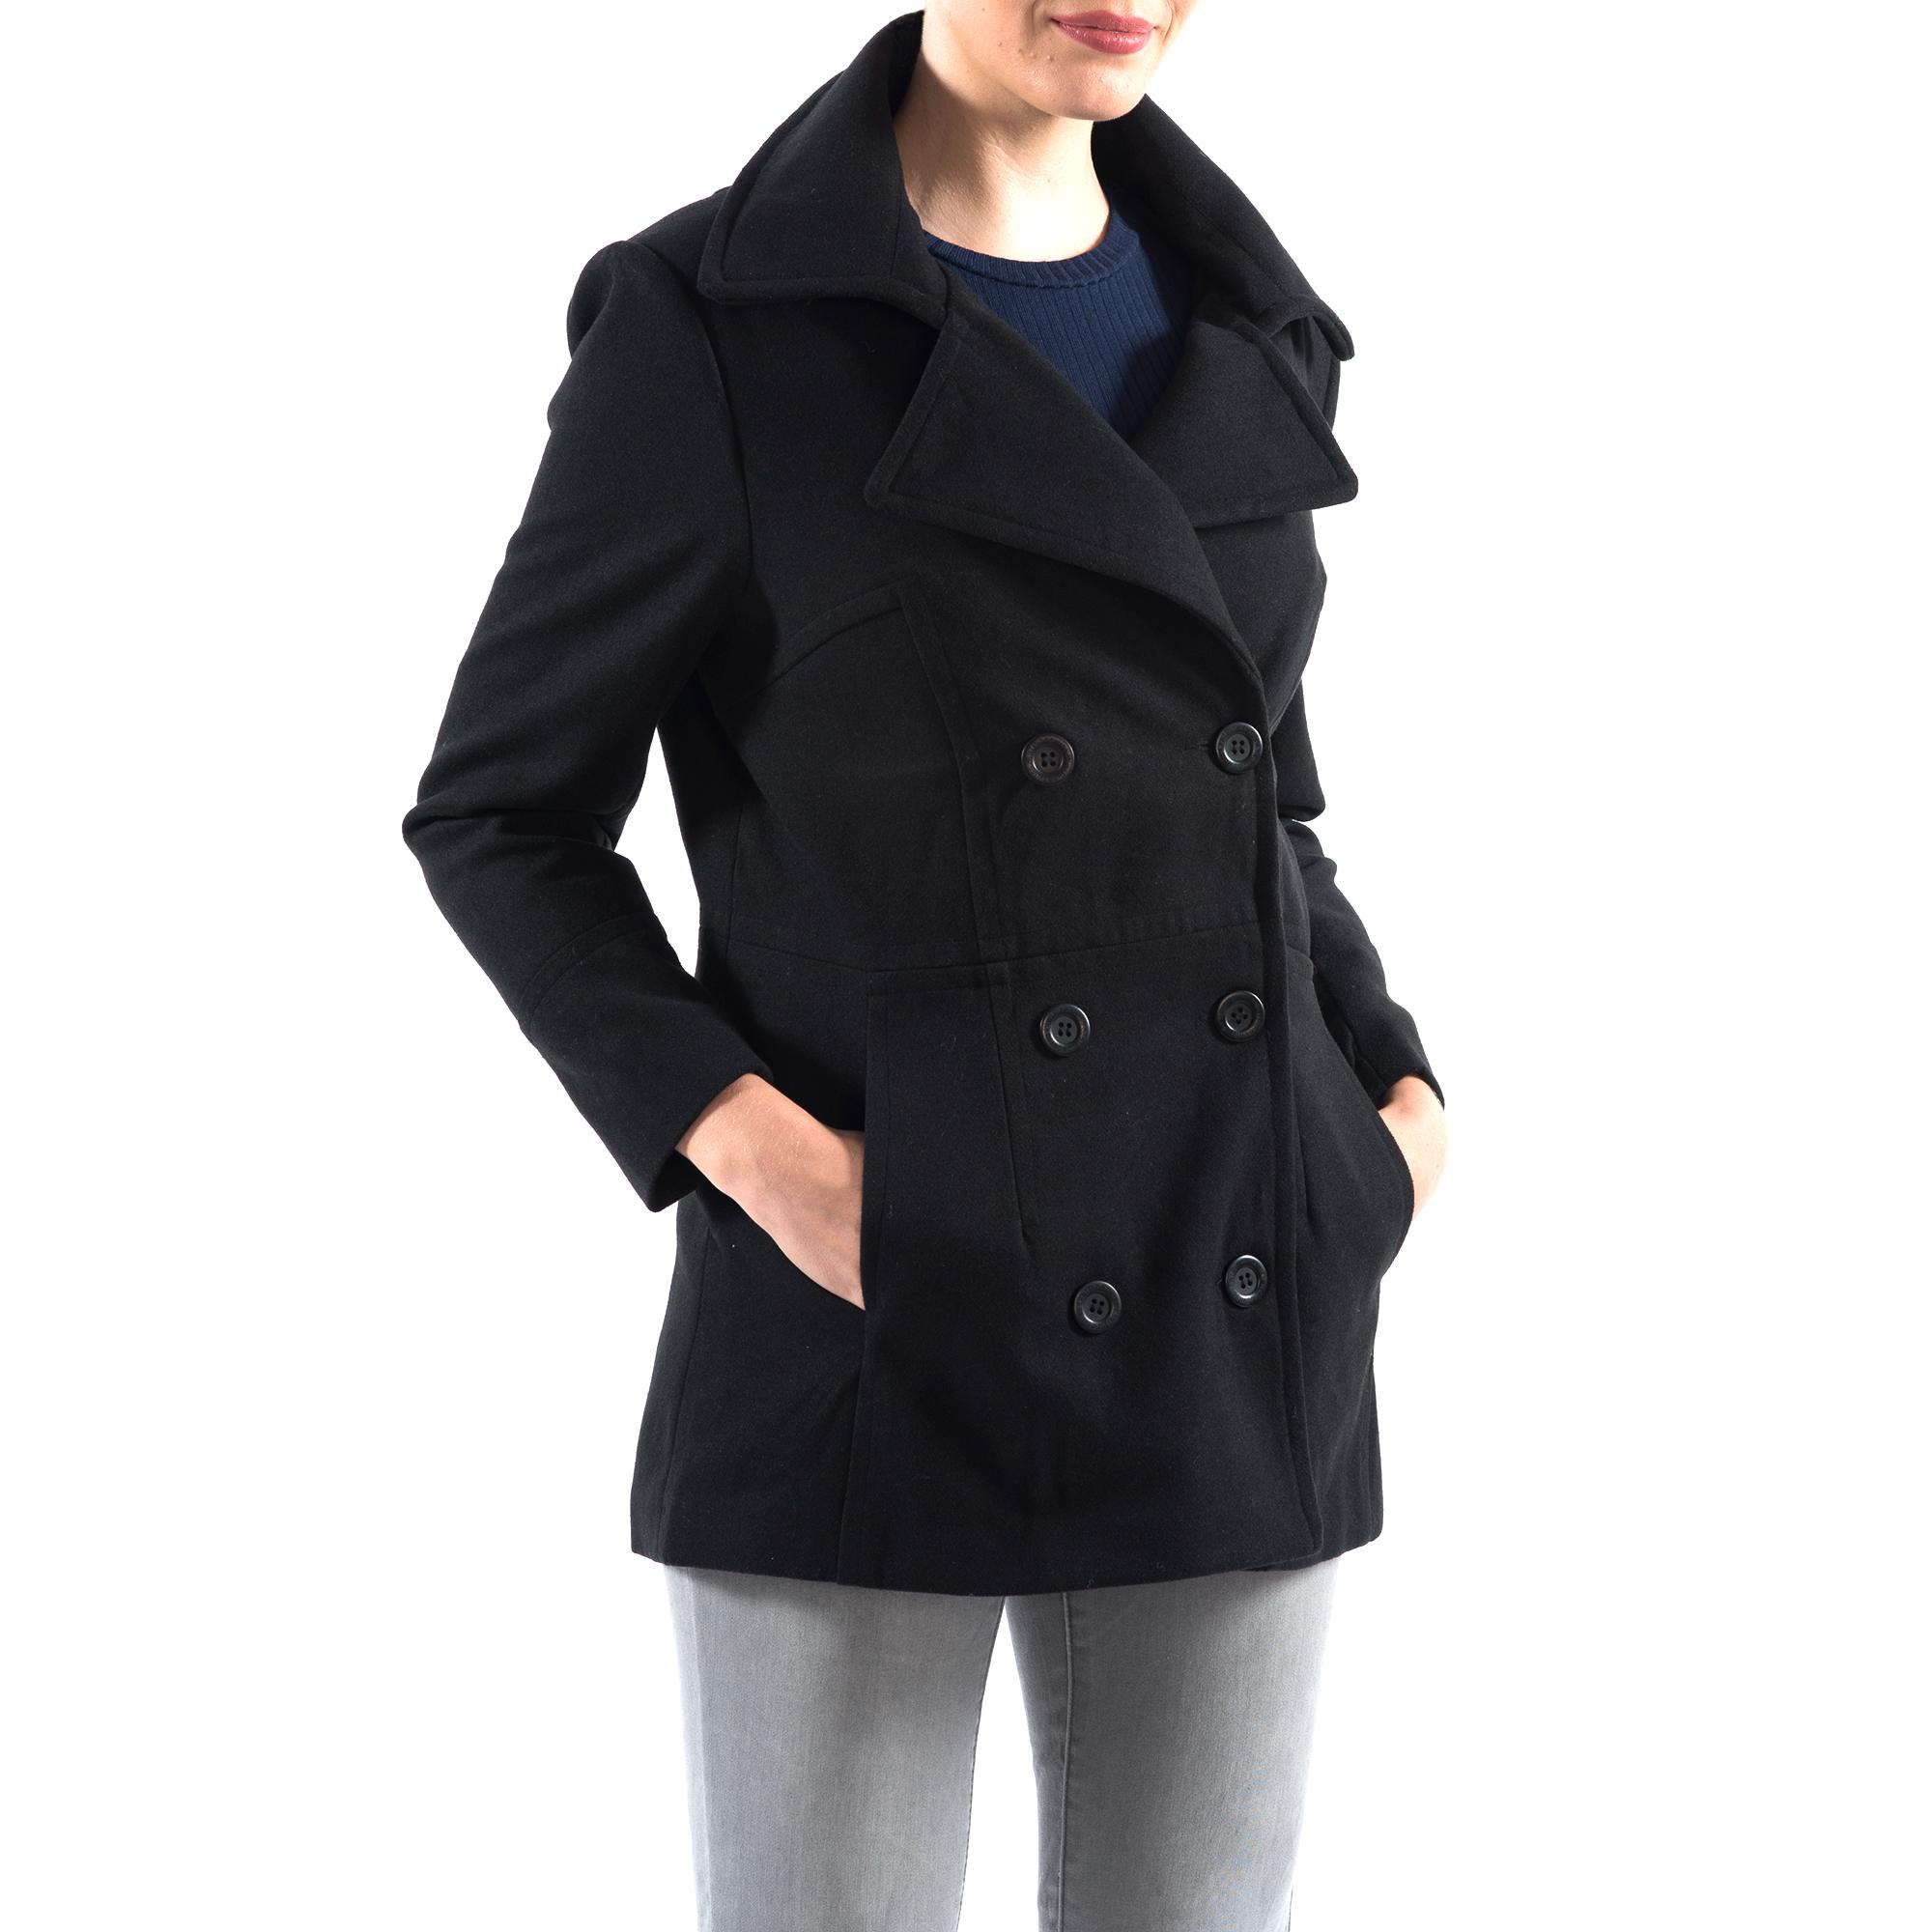 Alpine-Swiss-Emma-Womens-Peacoat-Jacket-Wool-Blazer-Double-Breasted-Overcoat-New thumbnail 17